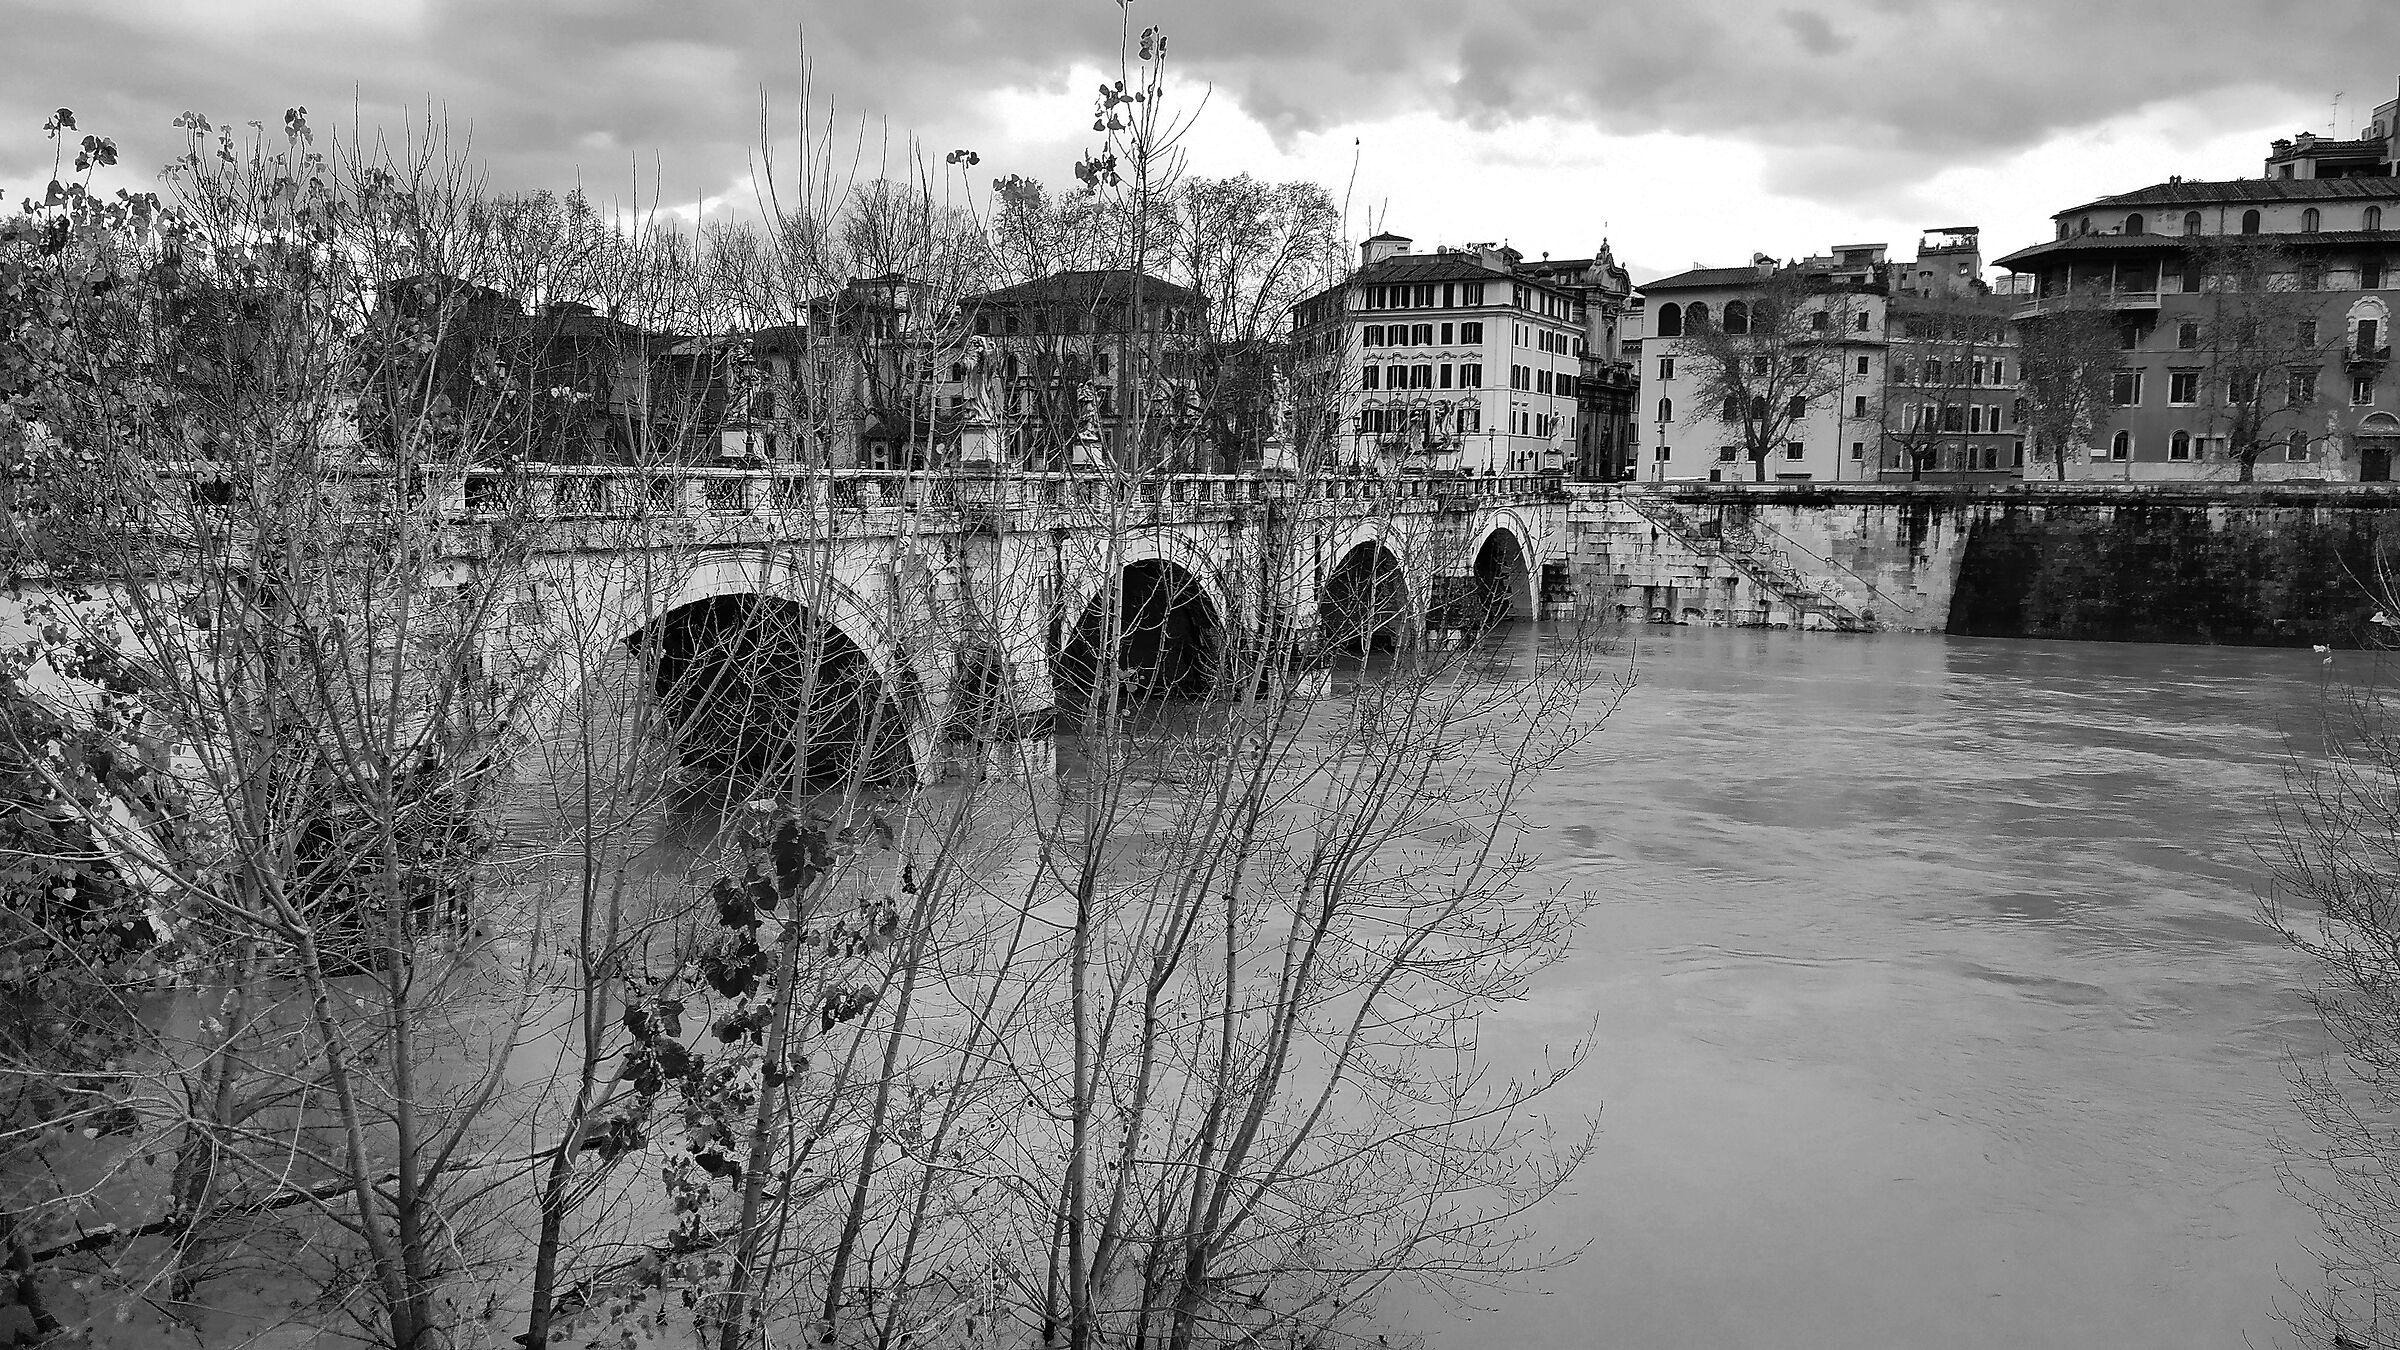 Fiume Tevere difronte Castel Sant'Angelo (Roma)...